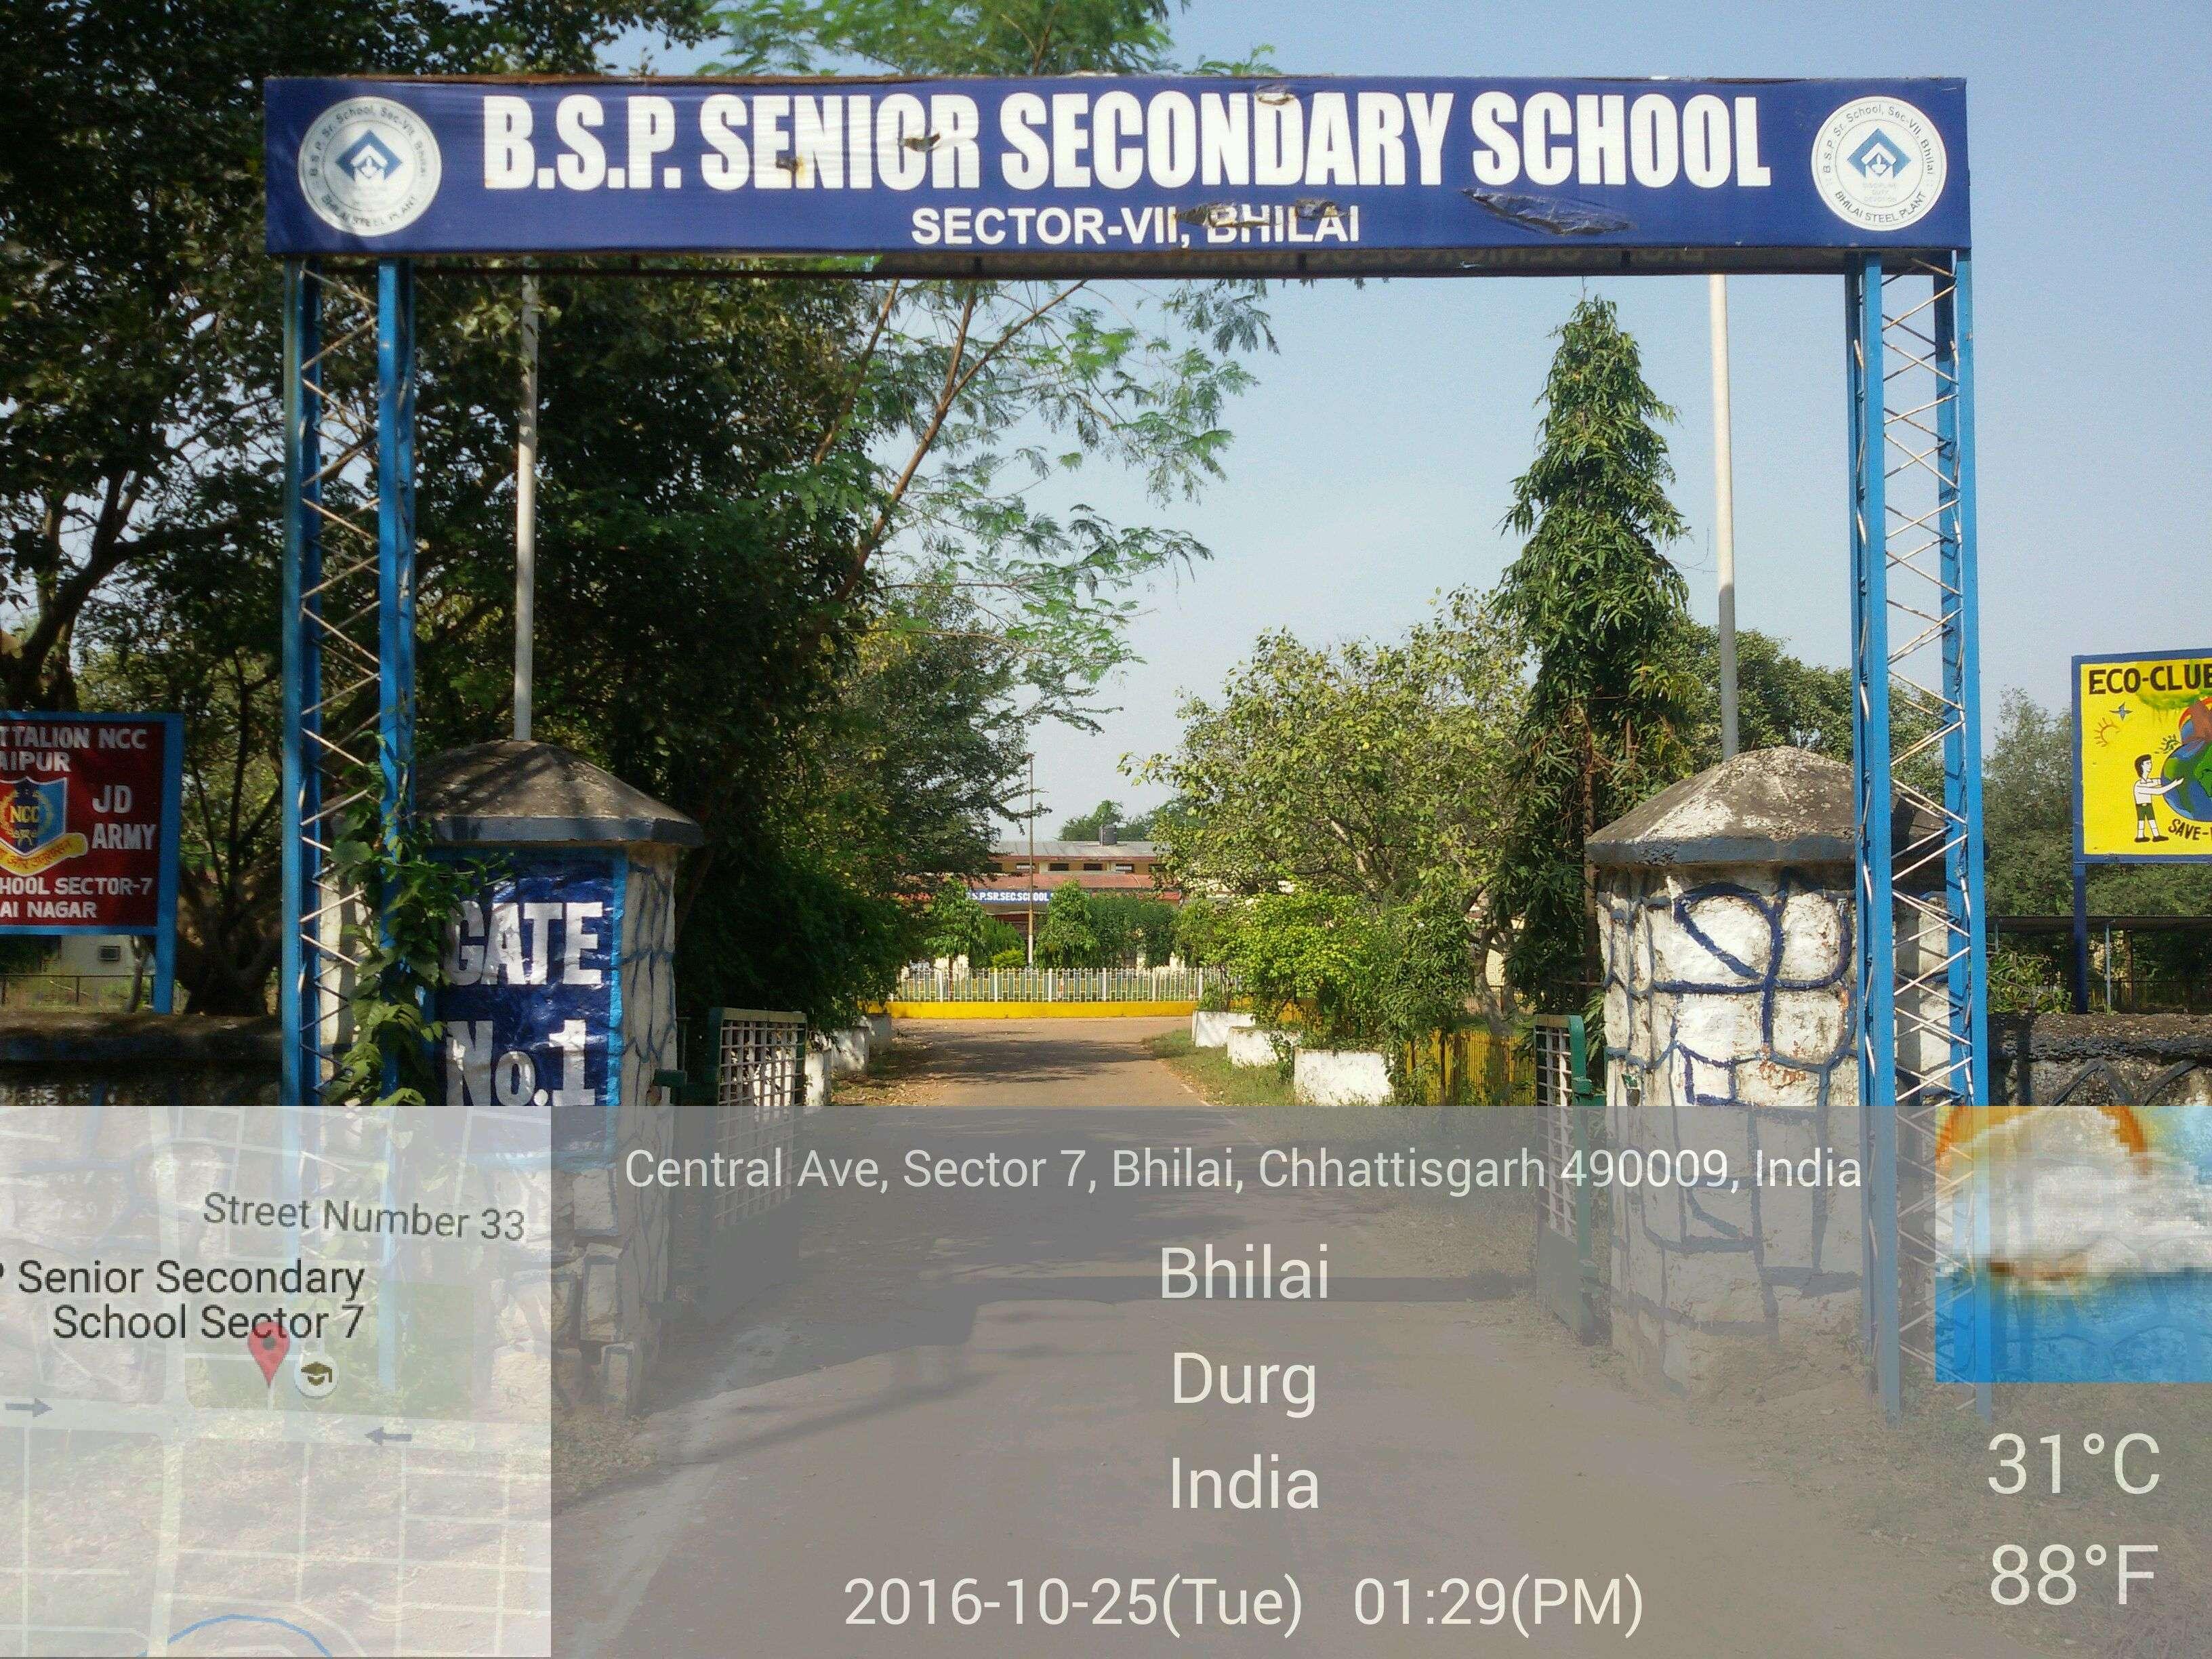 BSP SR SECONDARY SCHOOL SEC VII BHILAI NAGAR DISTT DURG CHHATTISGARH 3330039